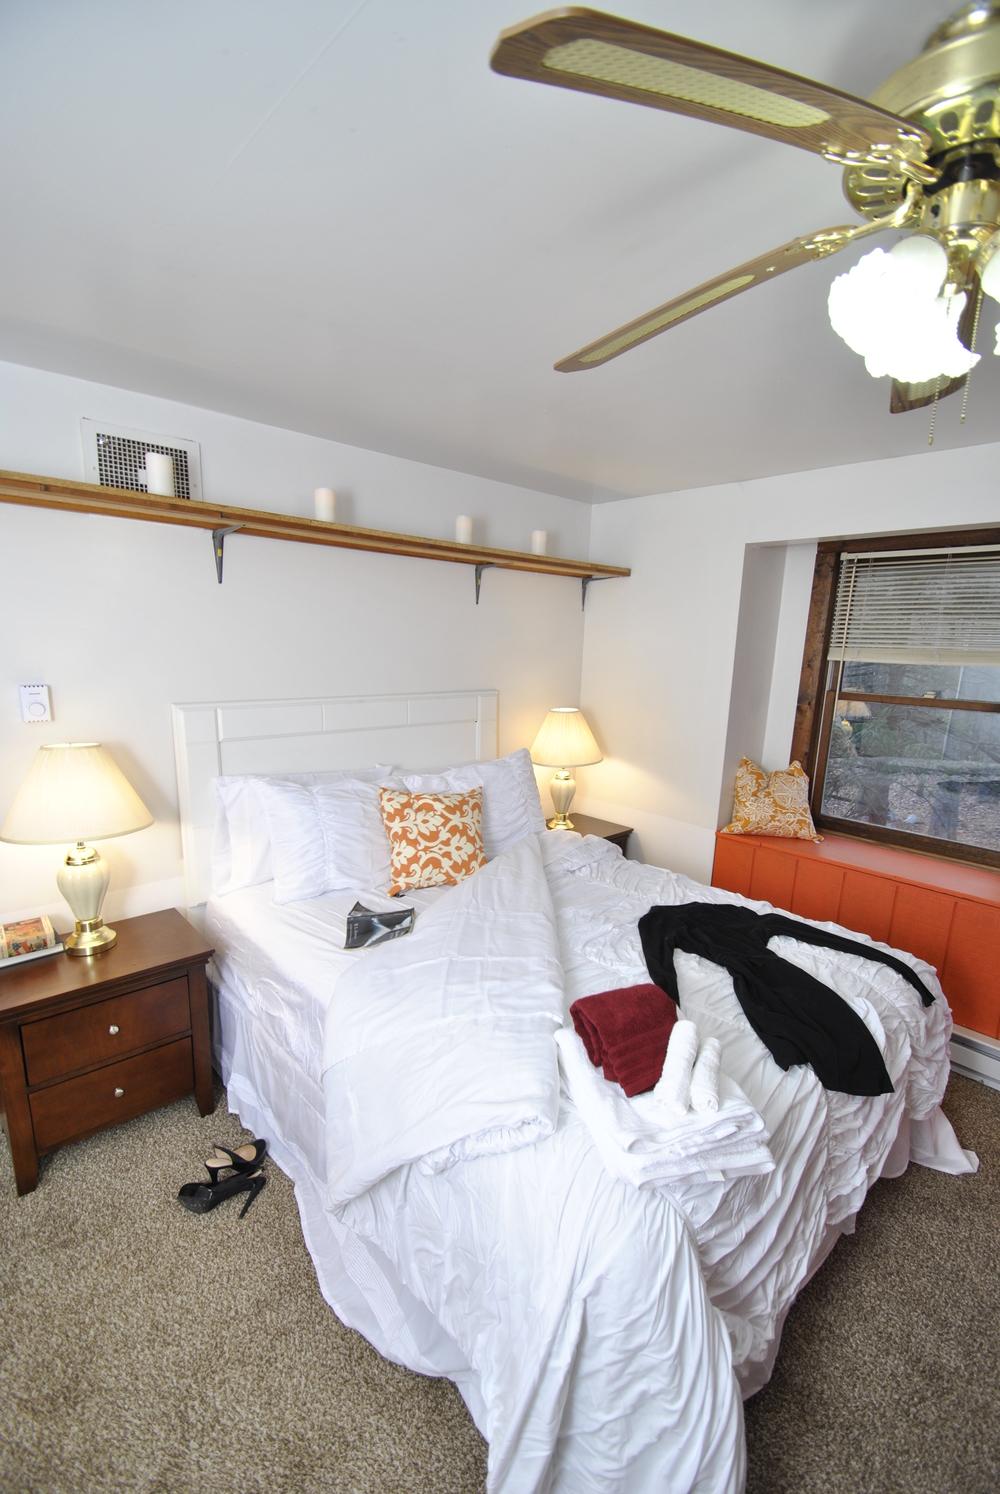 Bed (7).JPG